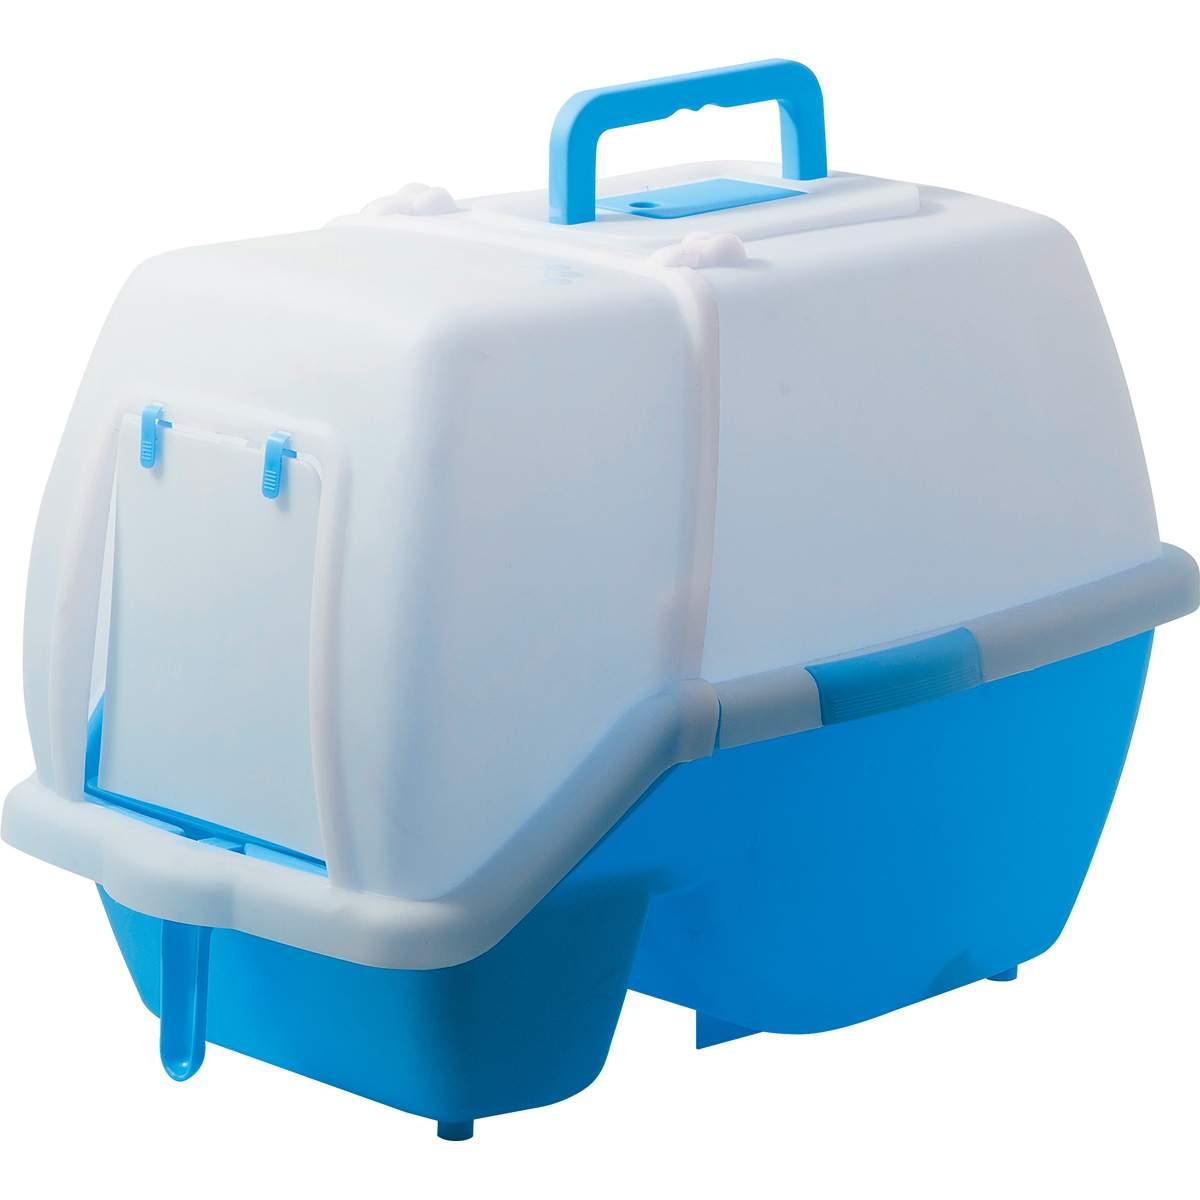 Туалет для кошек ZooOne, прямоугольный, синий, 60х42х45